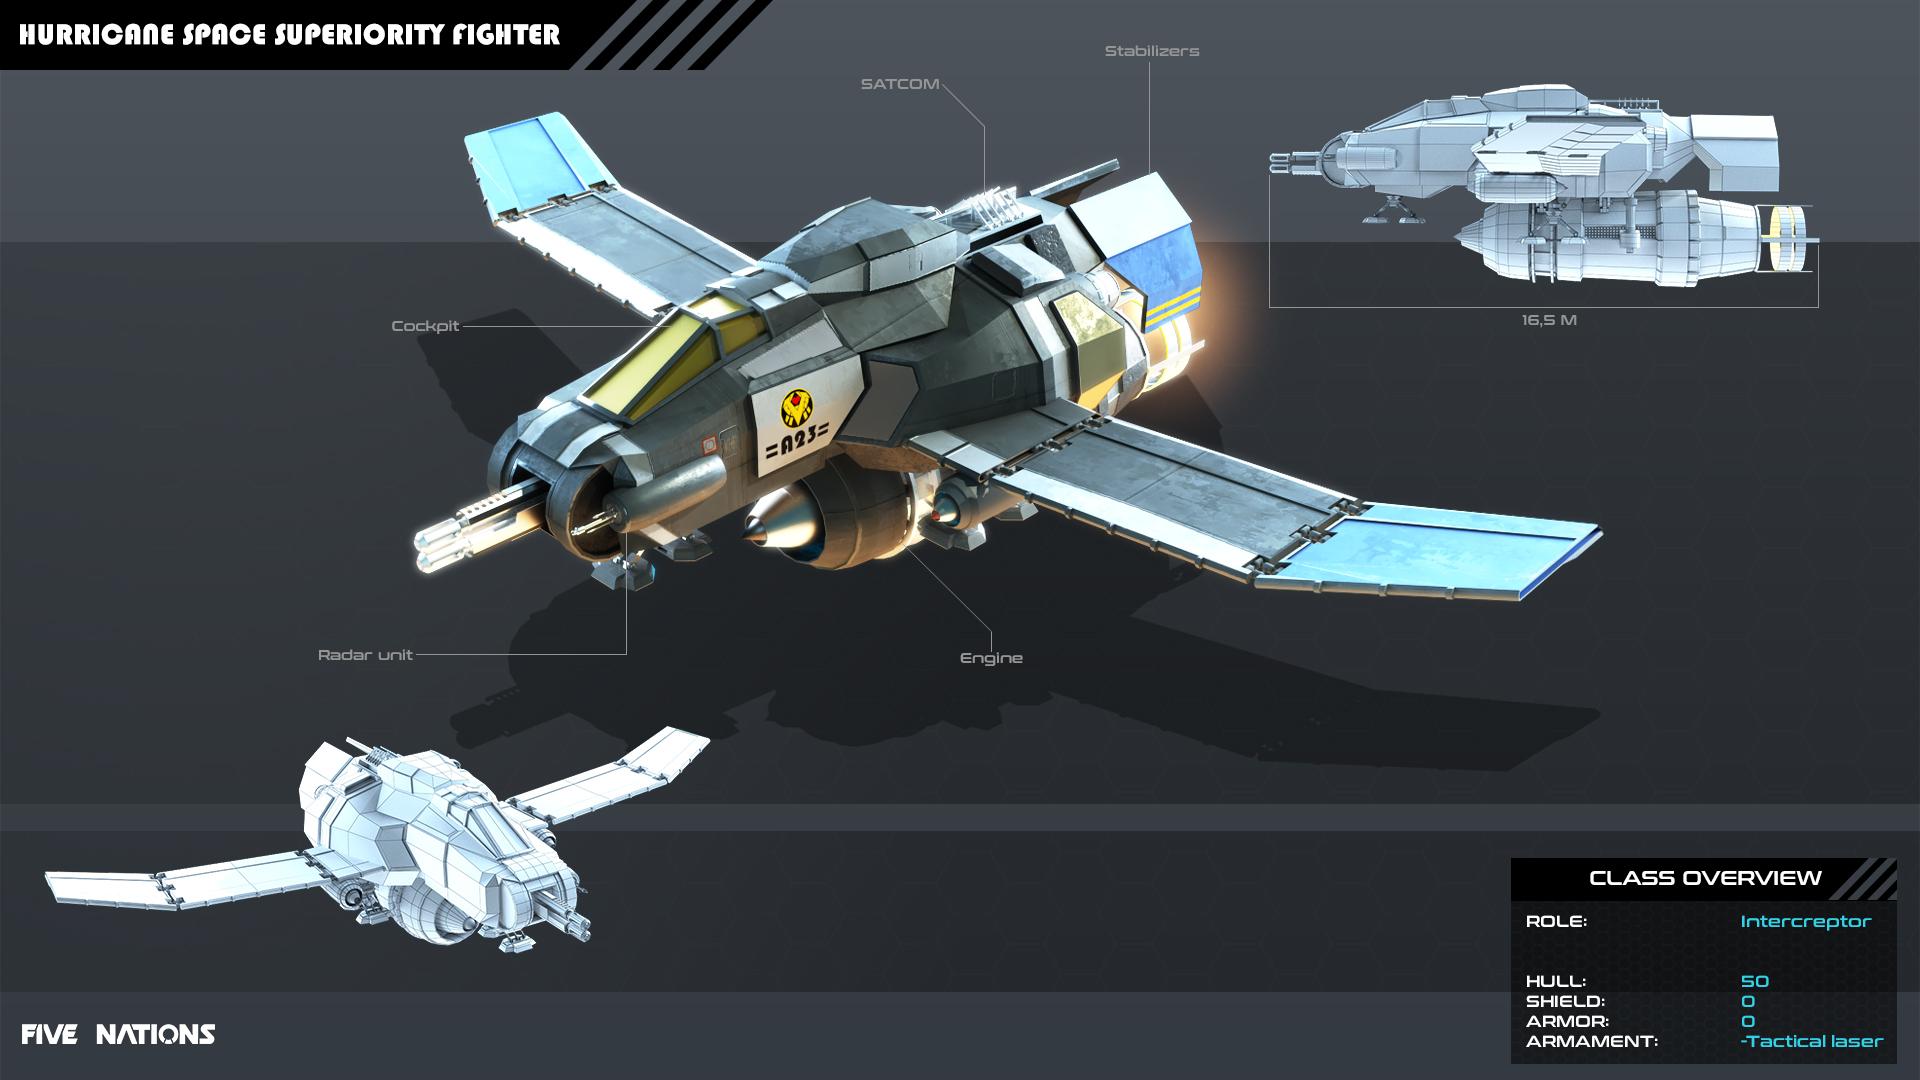 FN_ship_hurricane.jpg